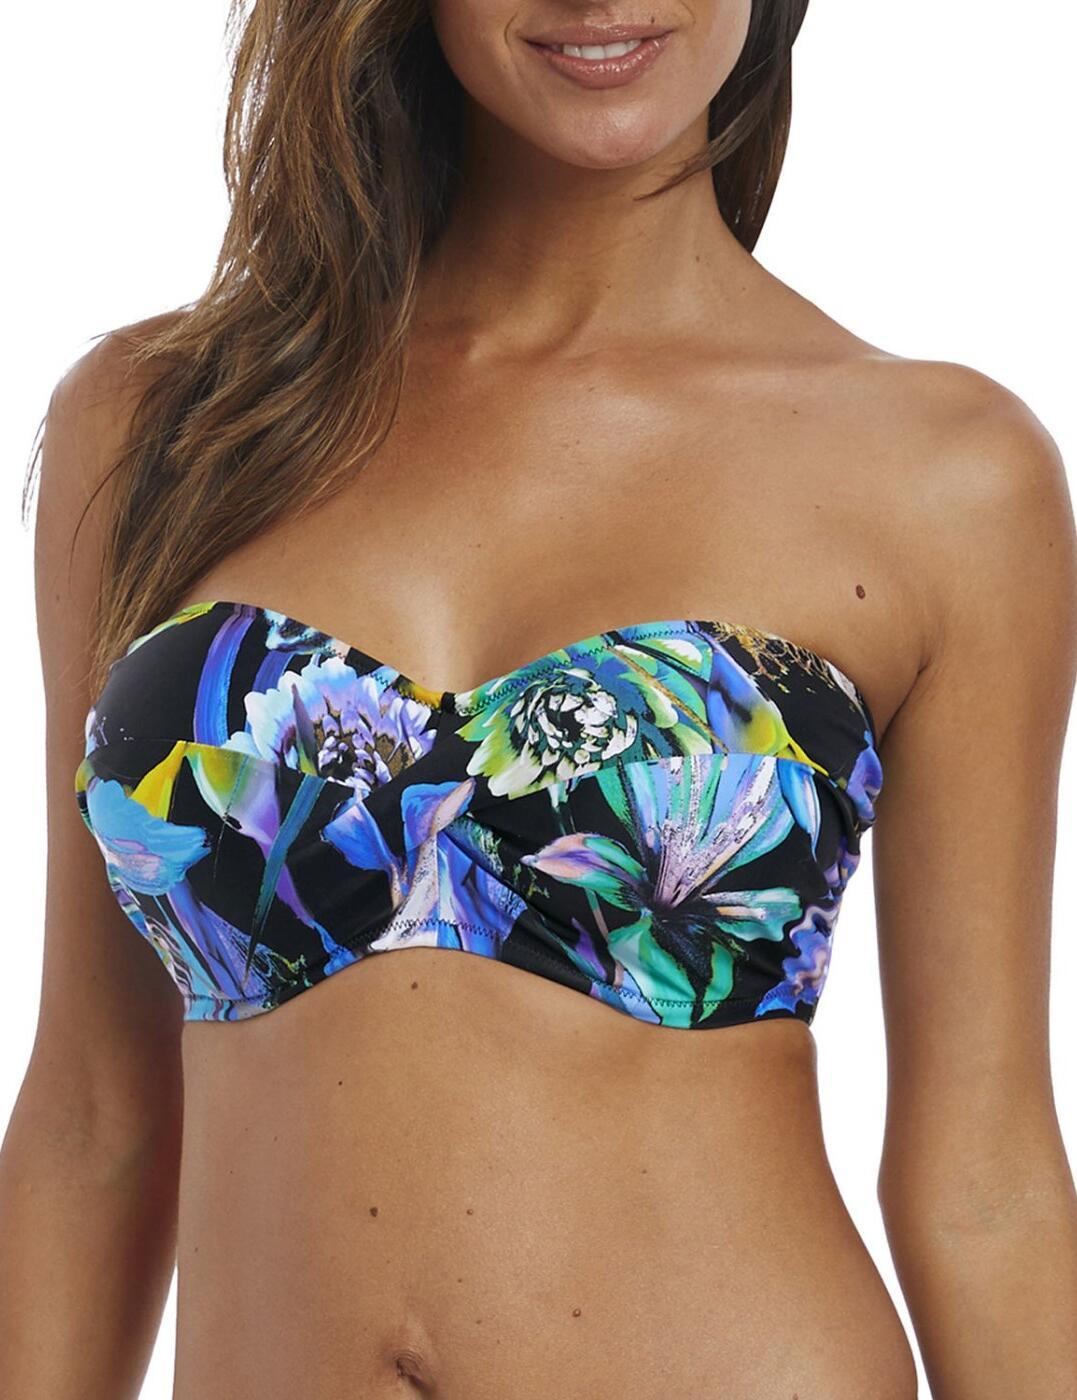 6476 Fantasie Paradise Bay Twist Bandeau Bikini Top - 6476 Aqua Multi